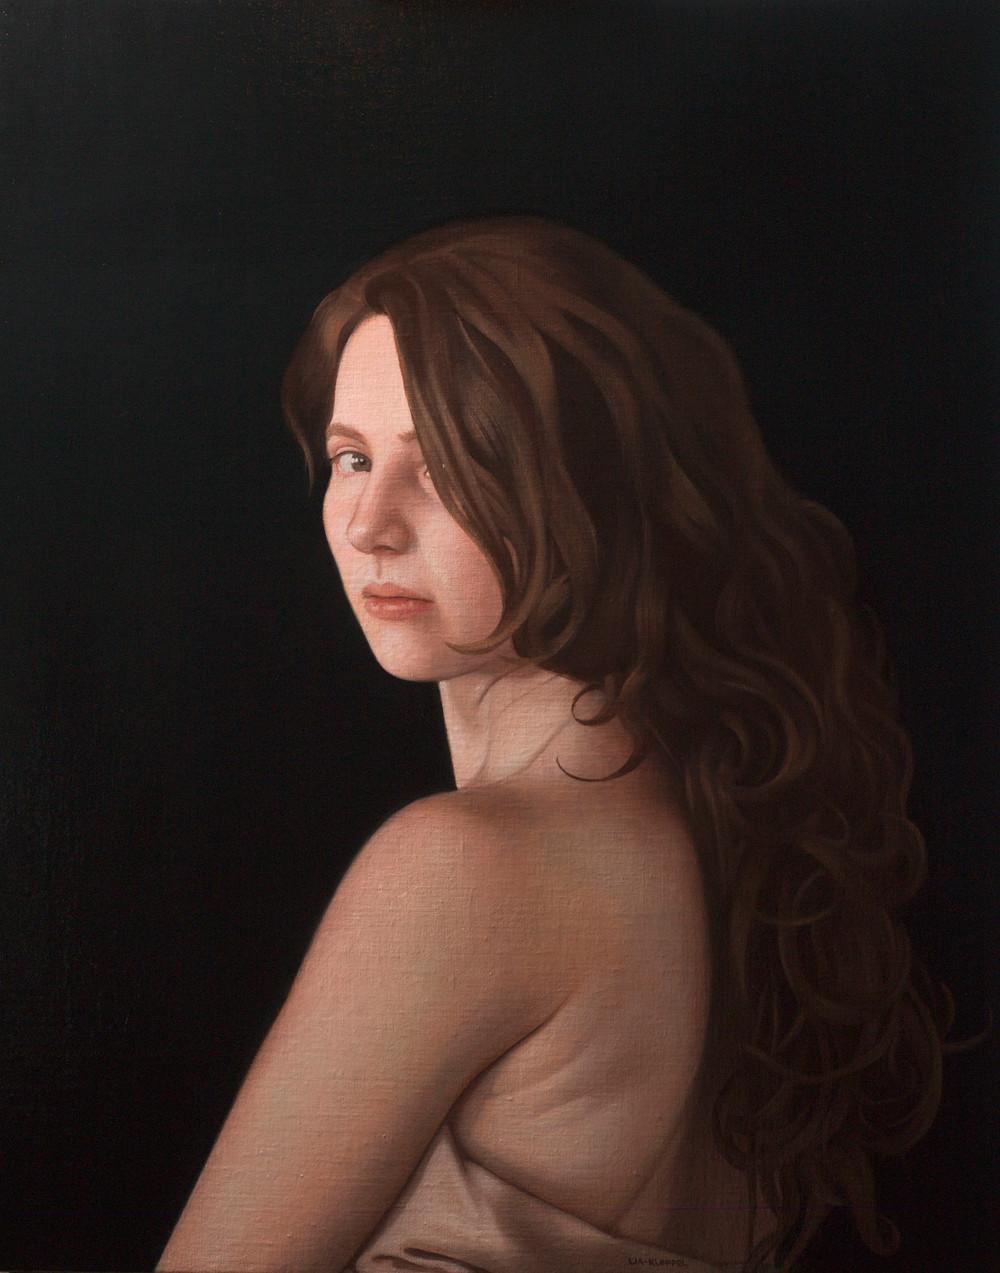 Mirada , 2015, Oil on linen, 24 x 20 inches